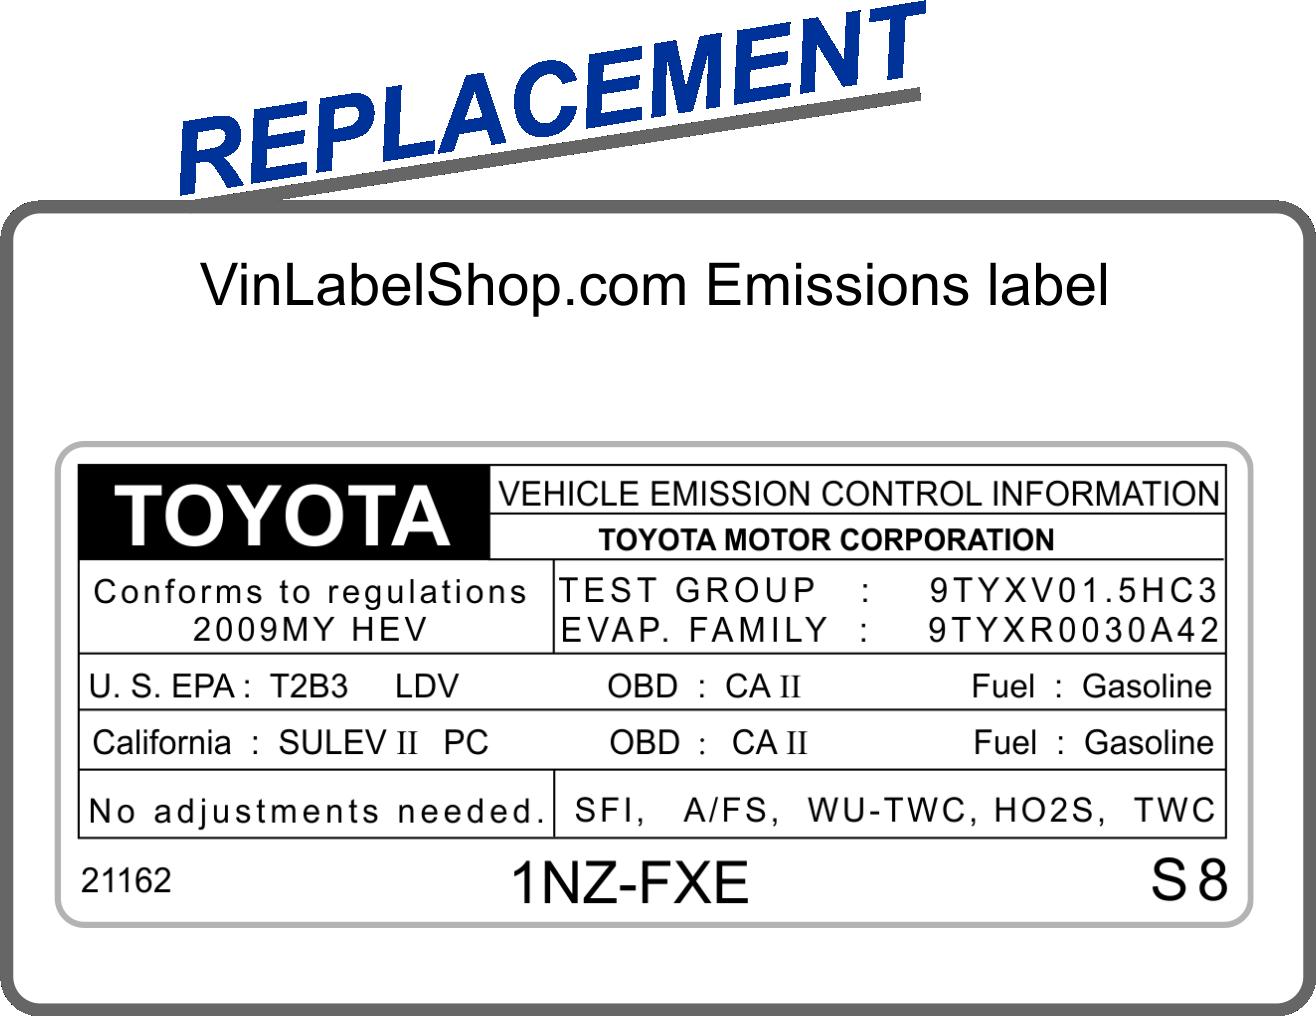 Replacement emission vin label